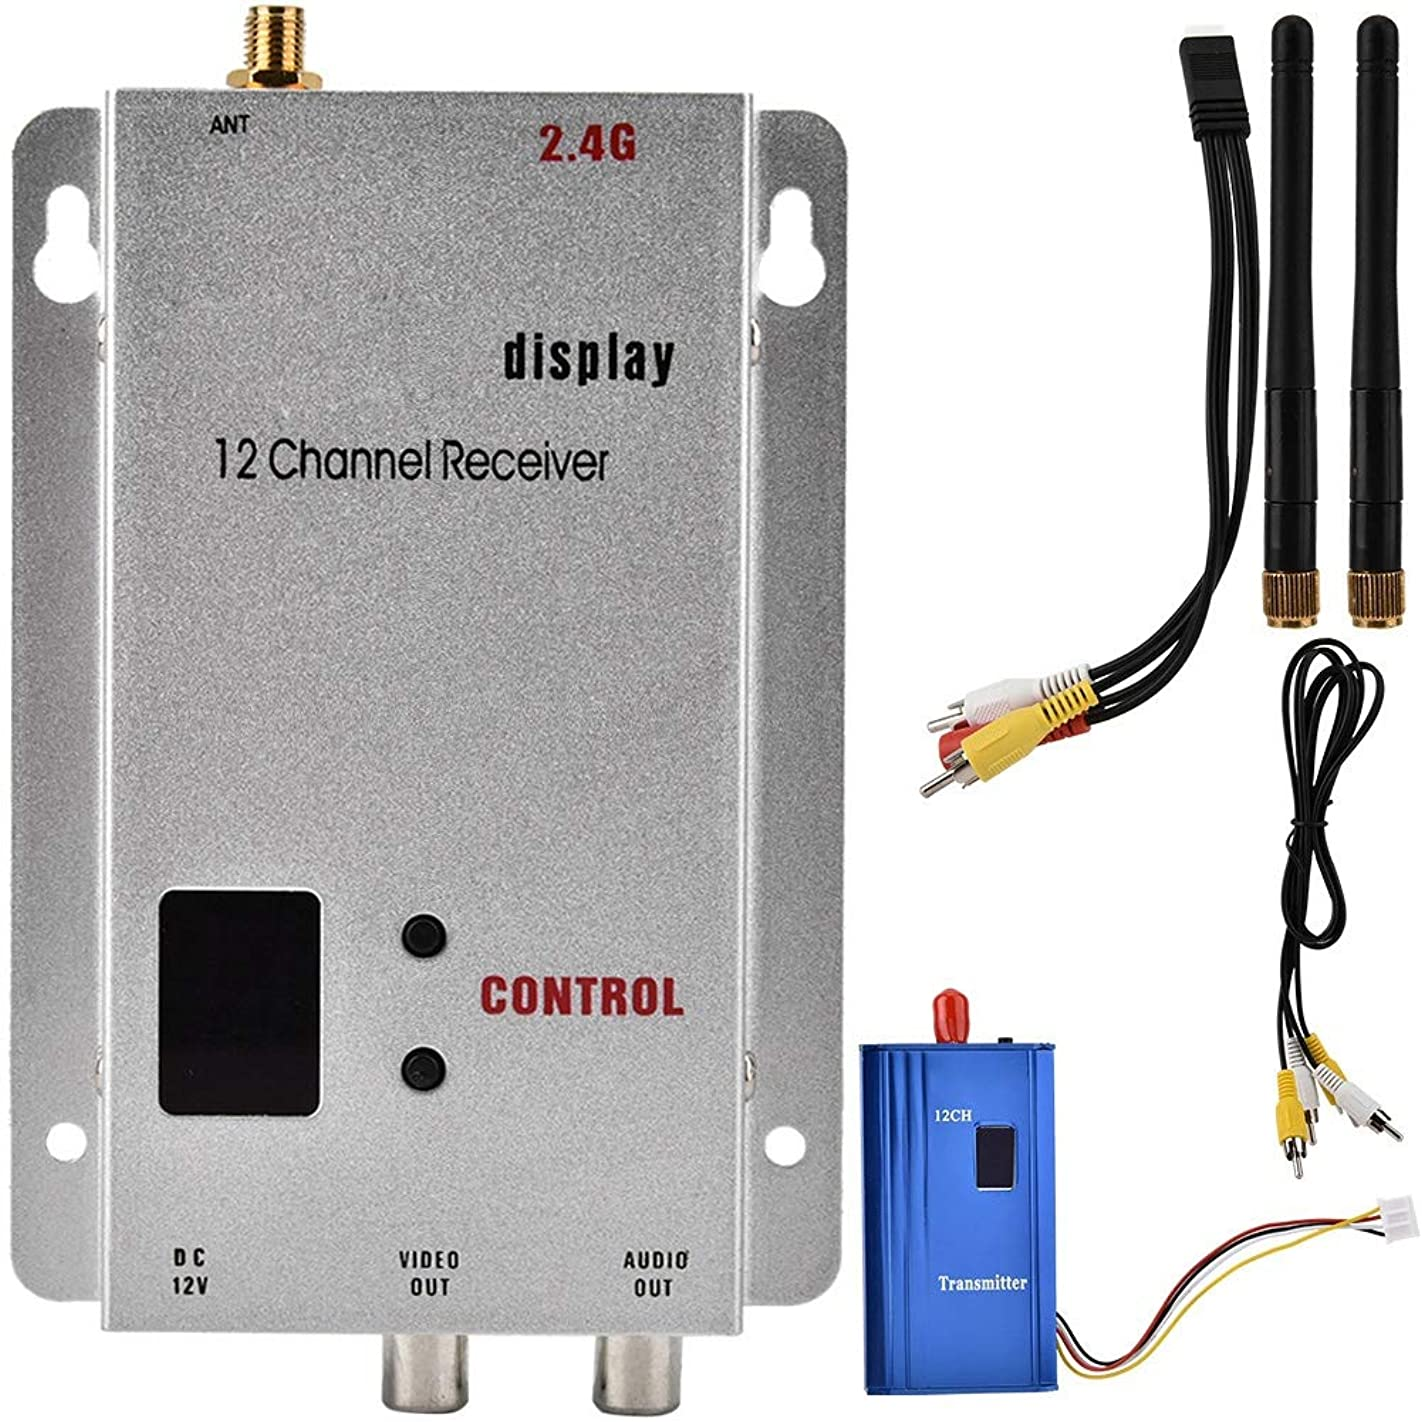 Wireless Audio Video Transmitter Receiver 2.4G 1000MW CCTV Transmitter Receiver l69777468633